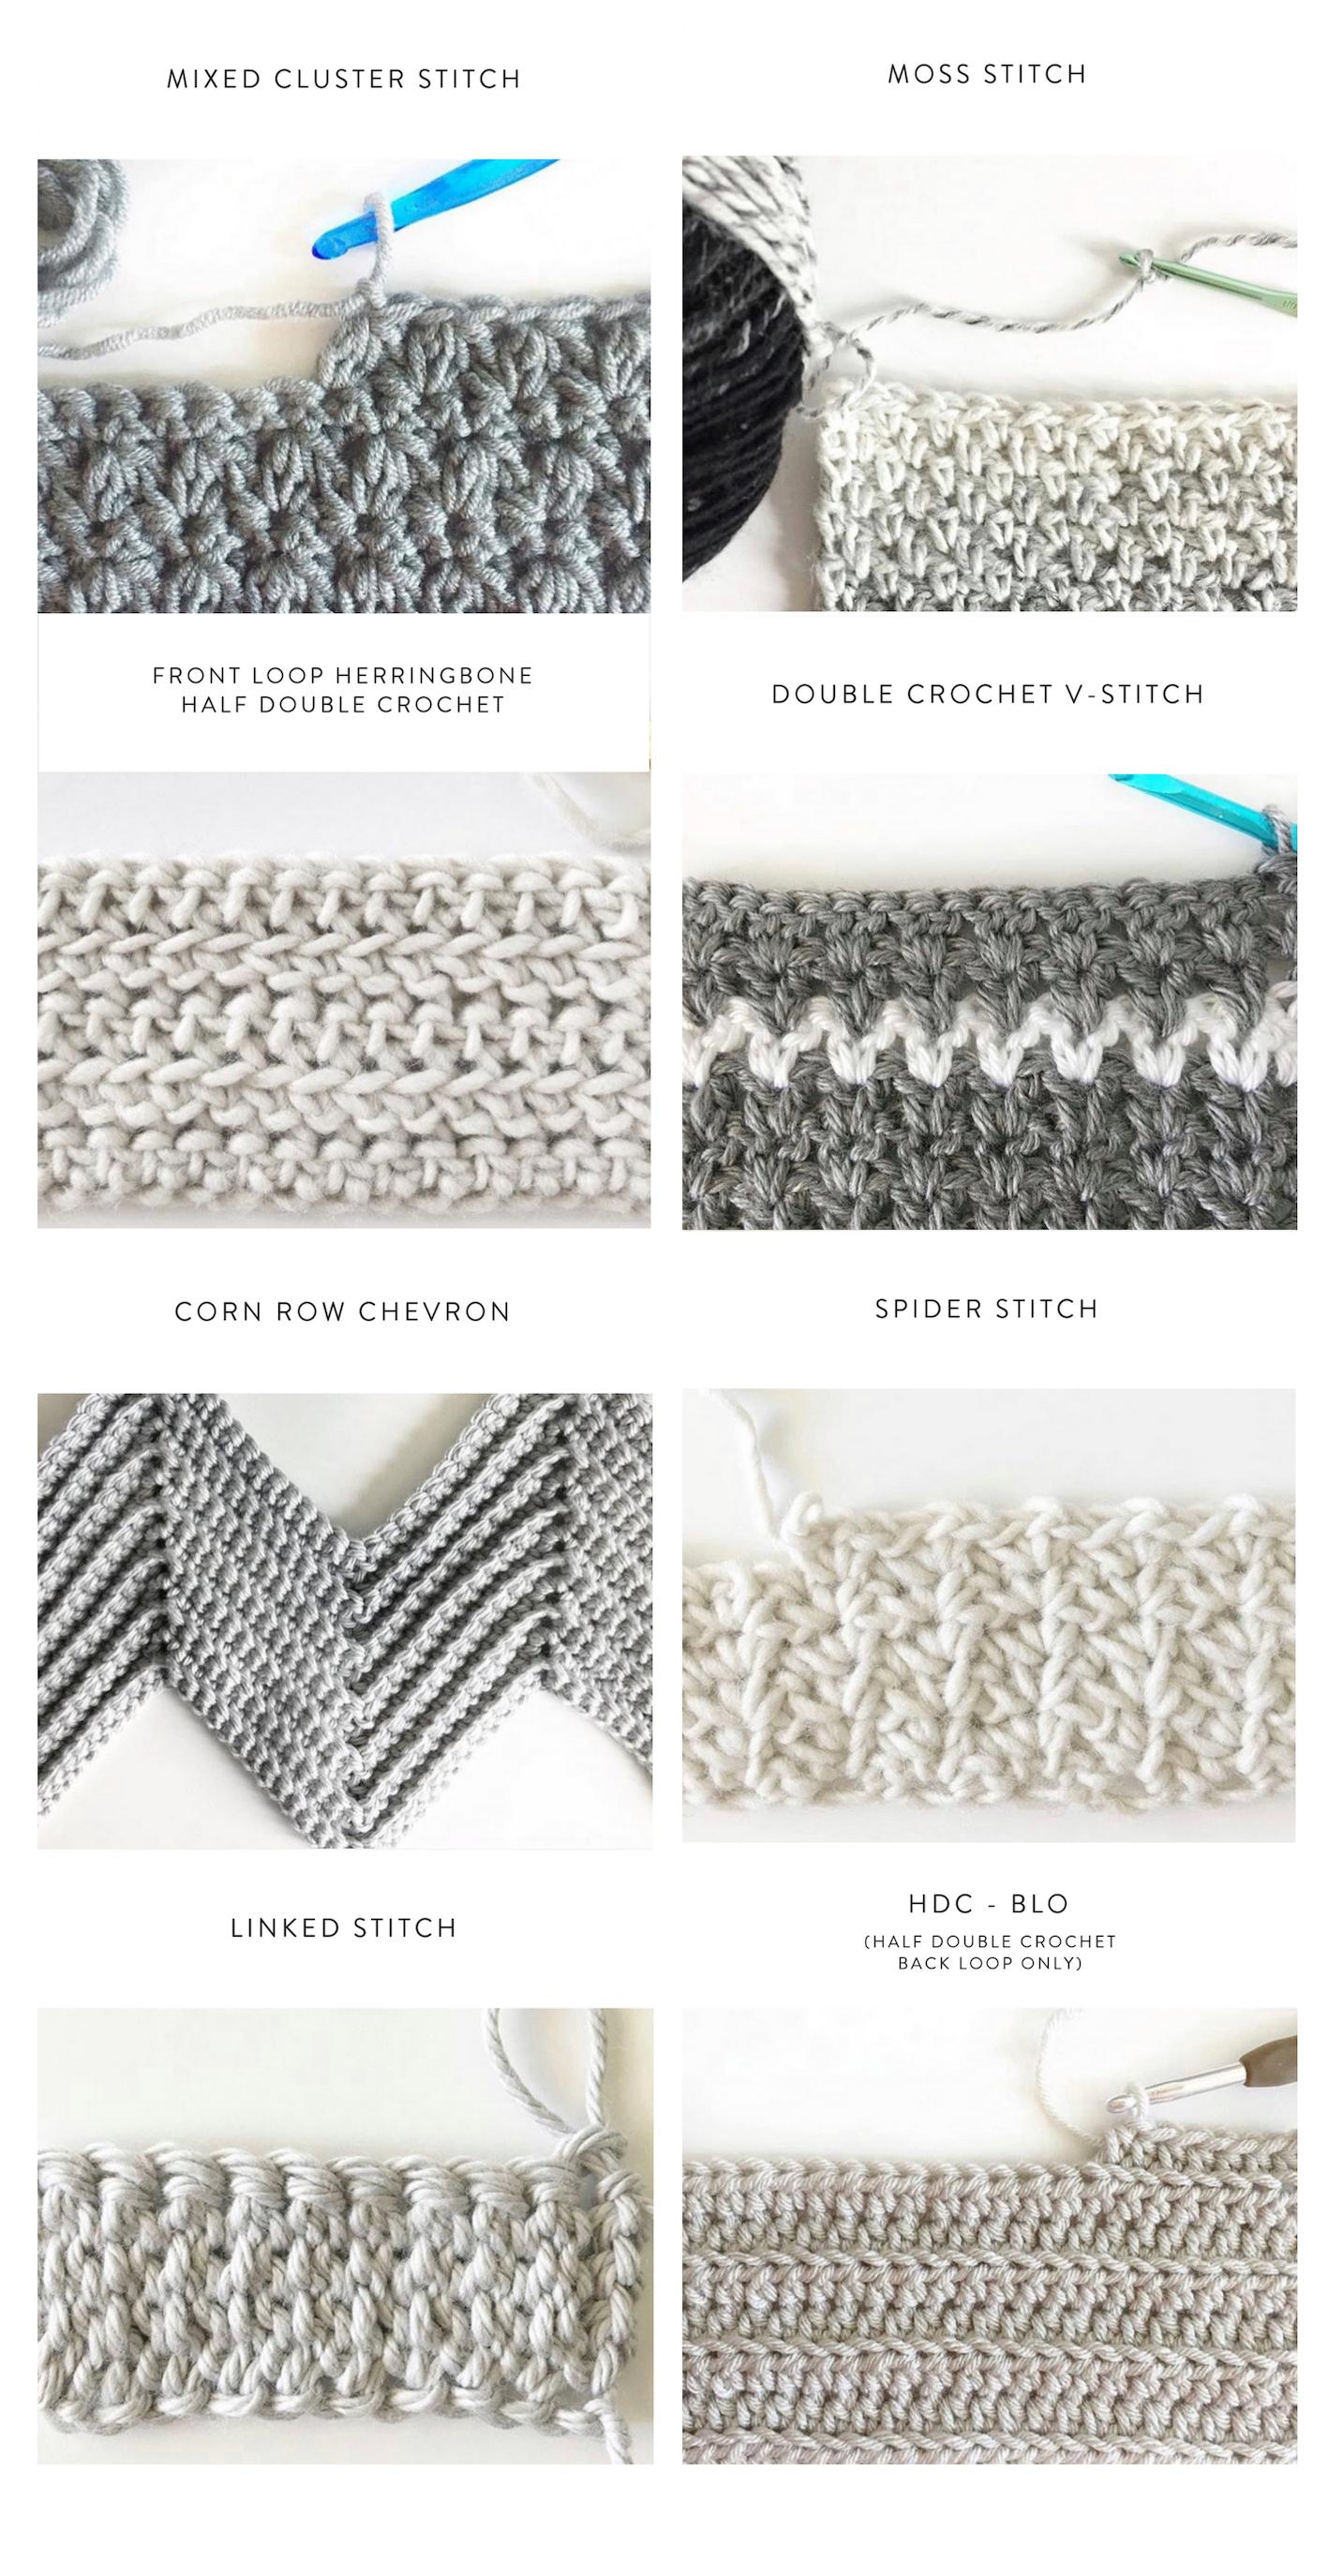 10 Amazing Make Crochet Look Like Knitting The Waistcoat Stitch Ideas In 2020 Crochet Stitches Crochet Stitches Tutorial Crochet Tutorial